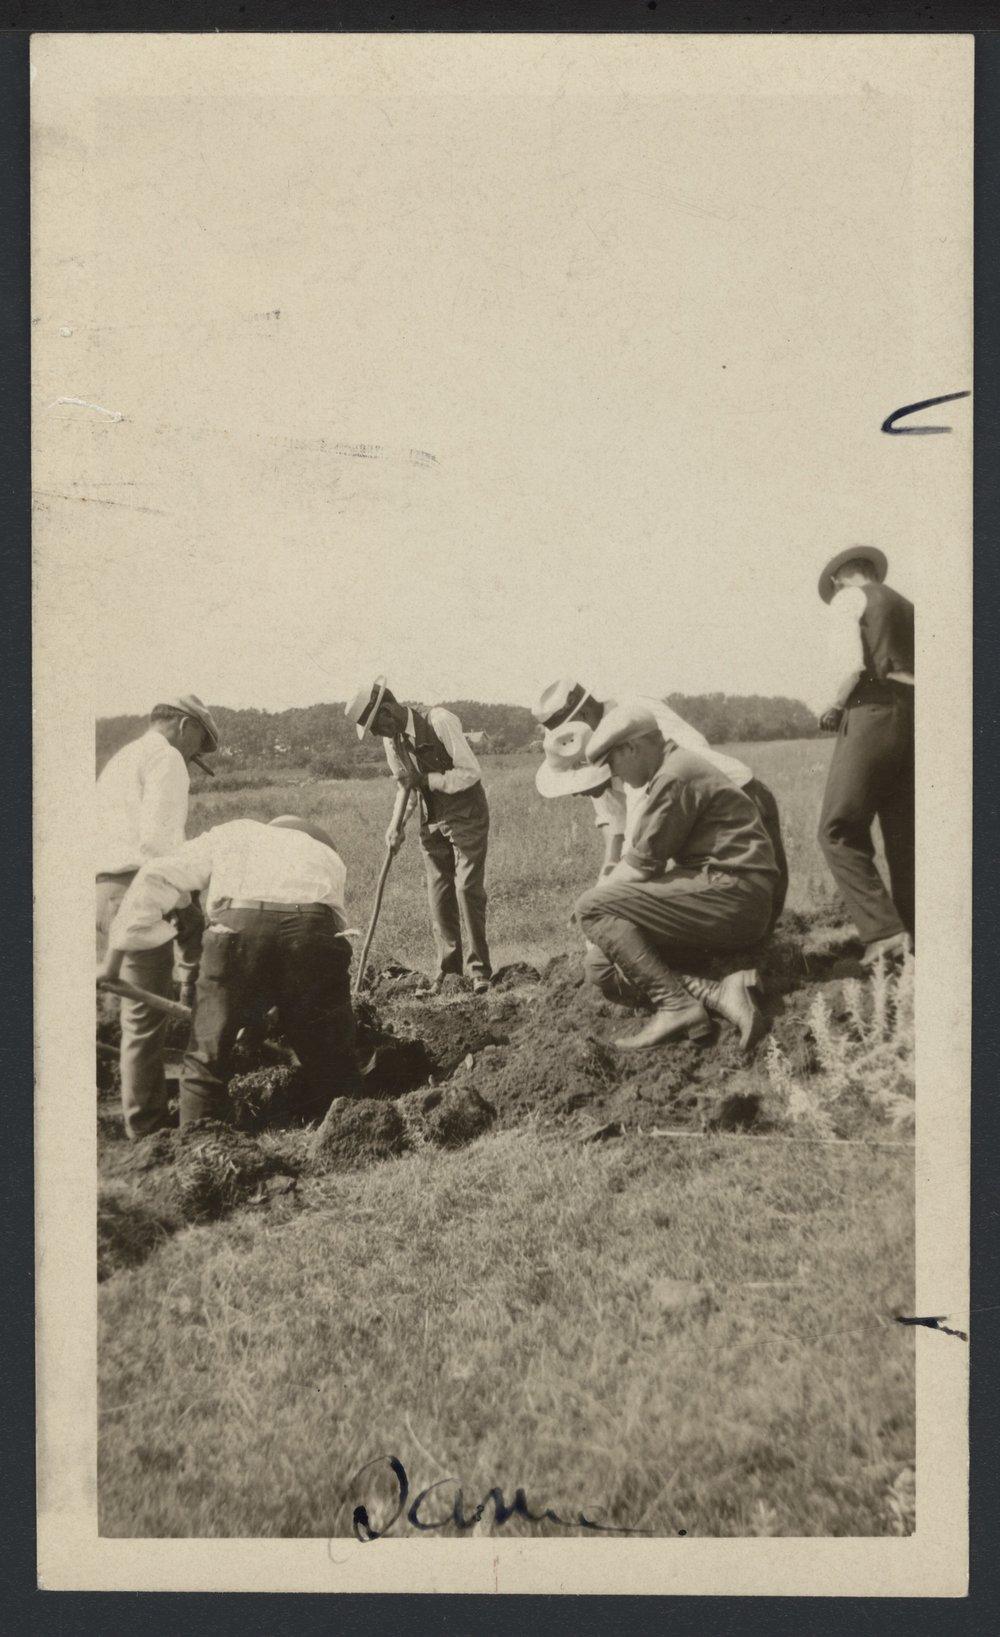 Zimmerman Park Expedition, Rice County, Kansas - *11